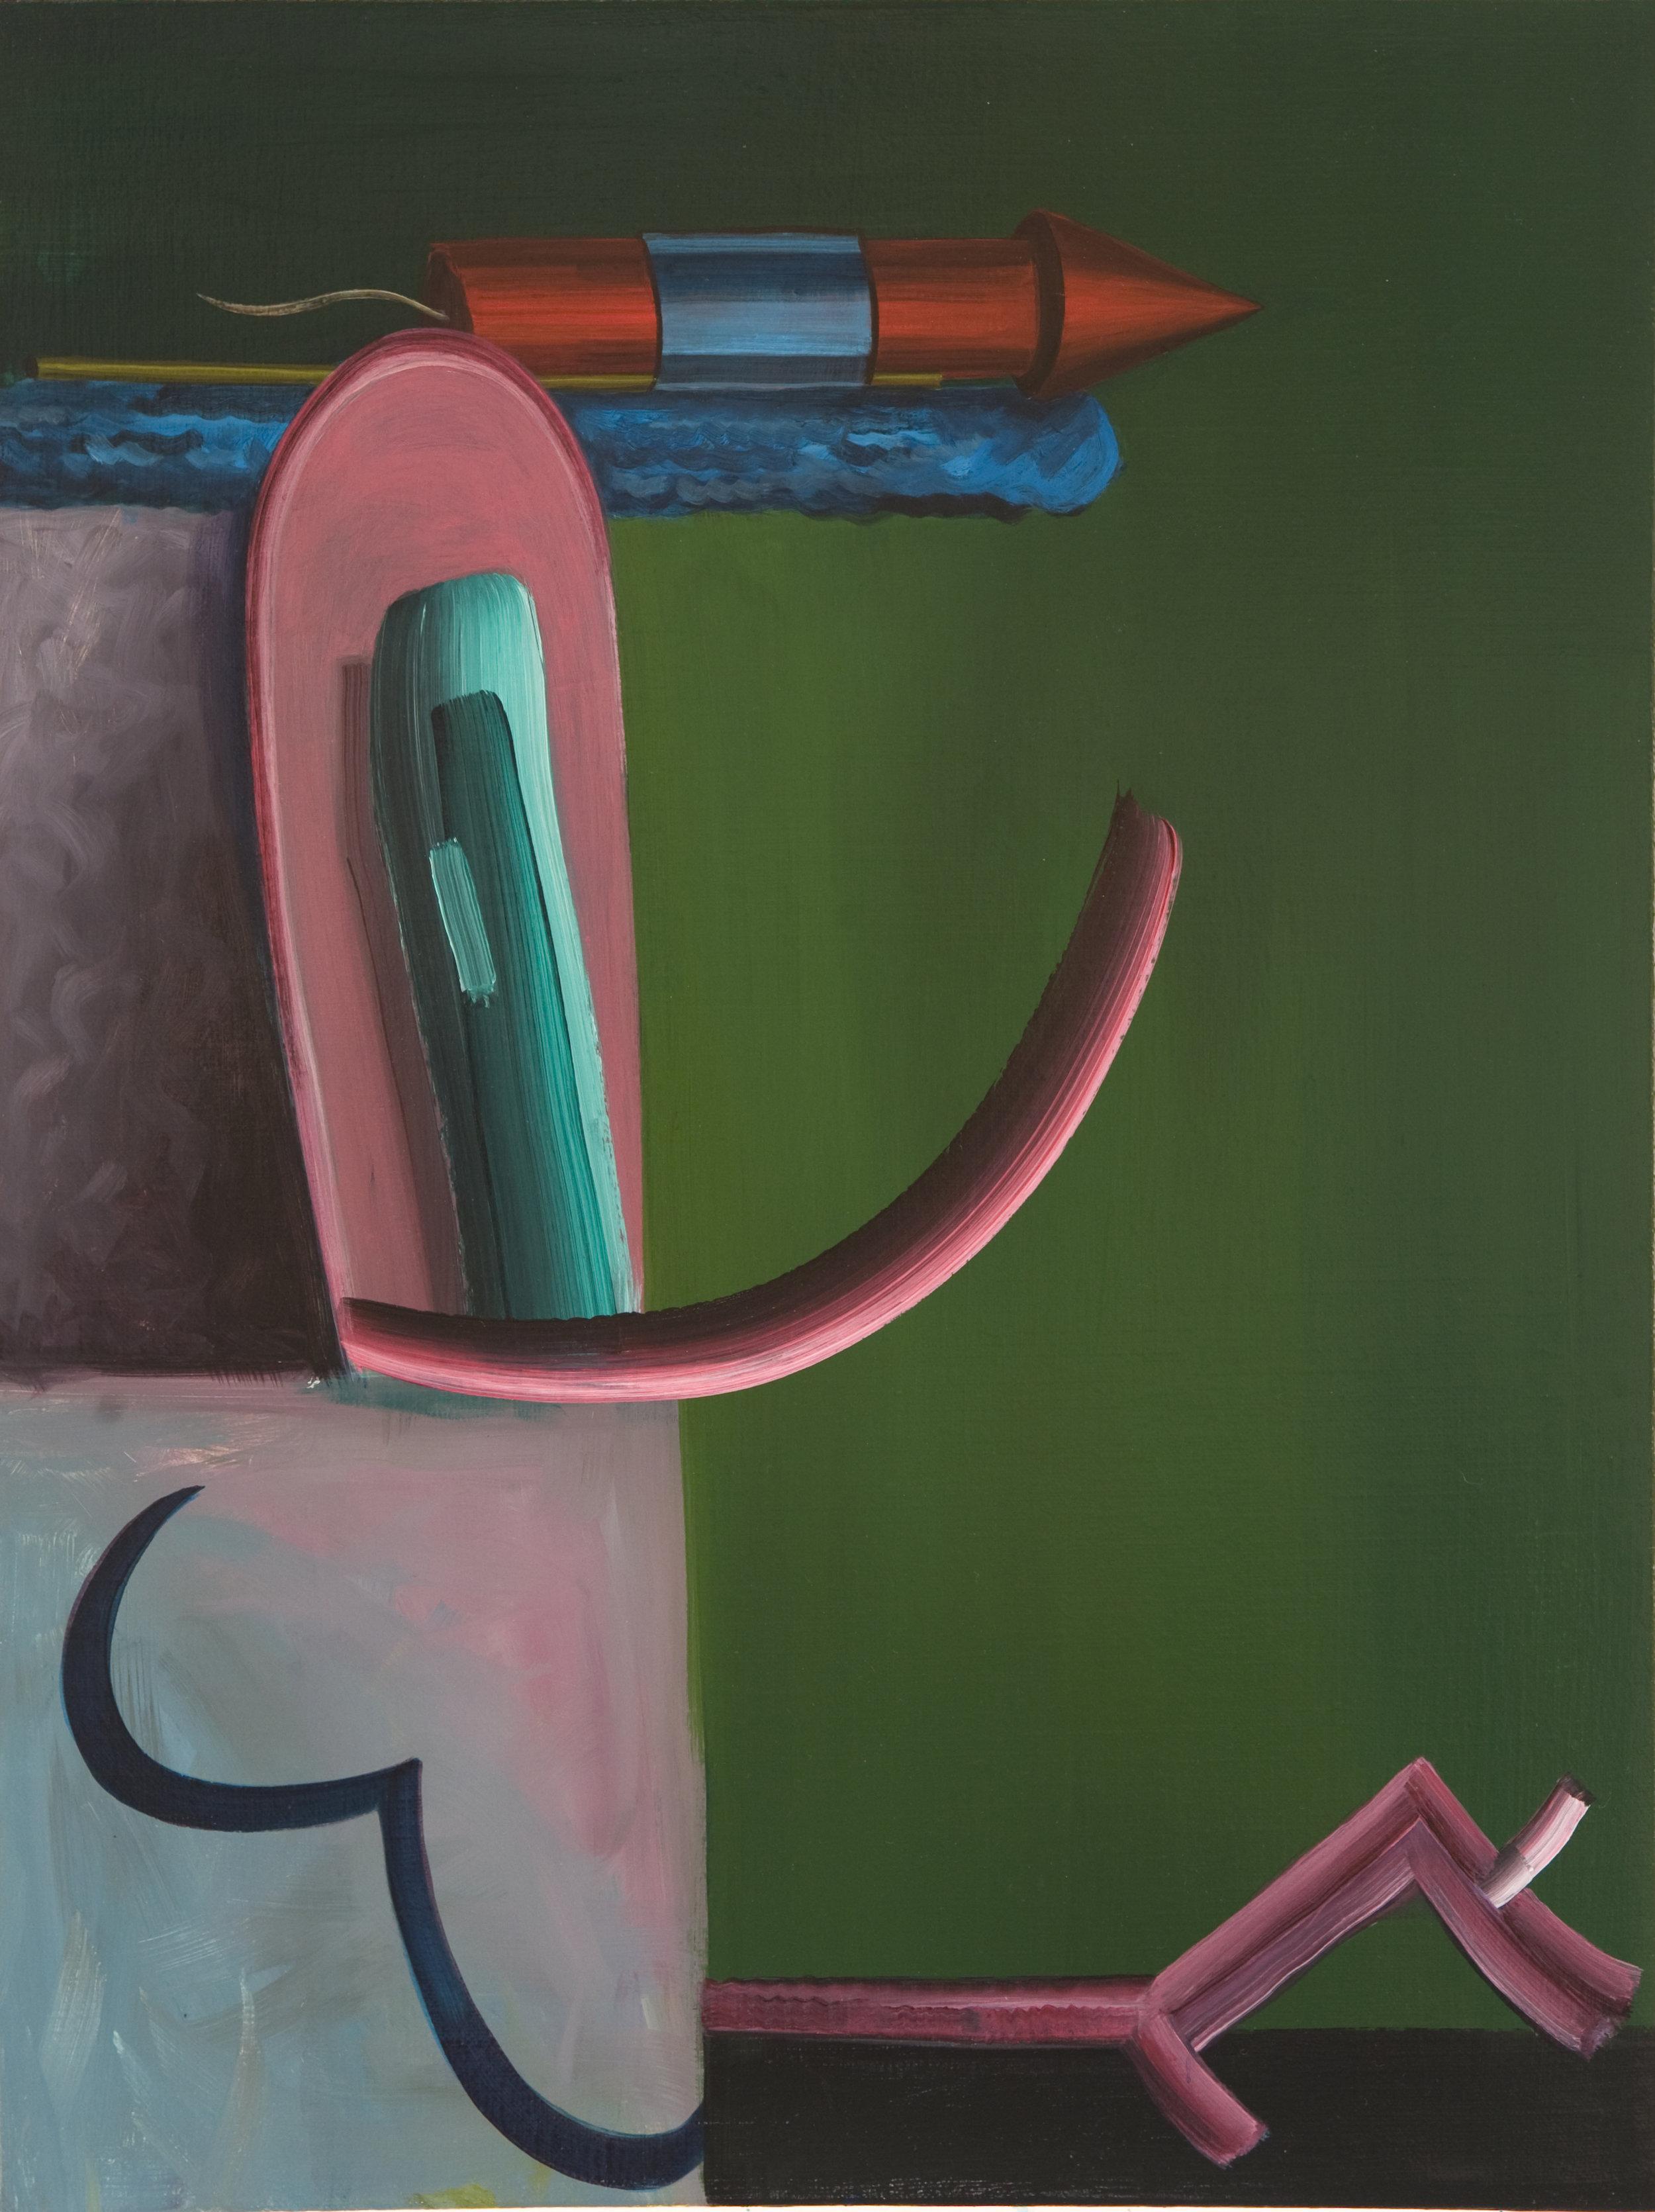 Untitled, 2011 Acrylic on linen. 59,5x44,5cm